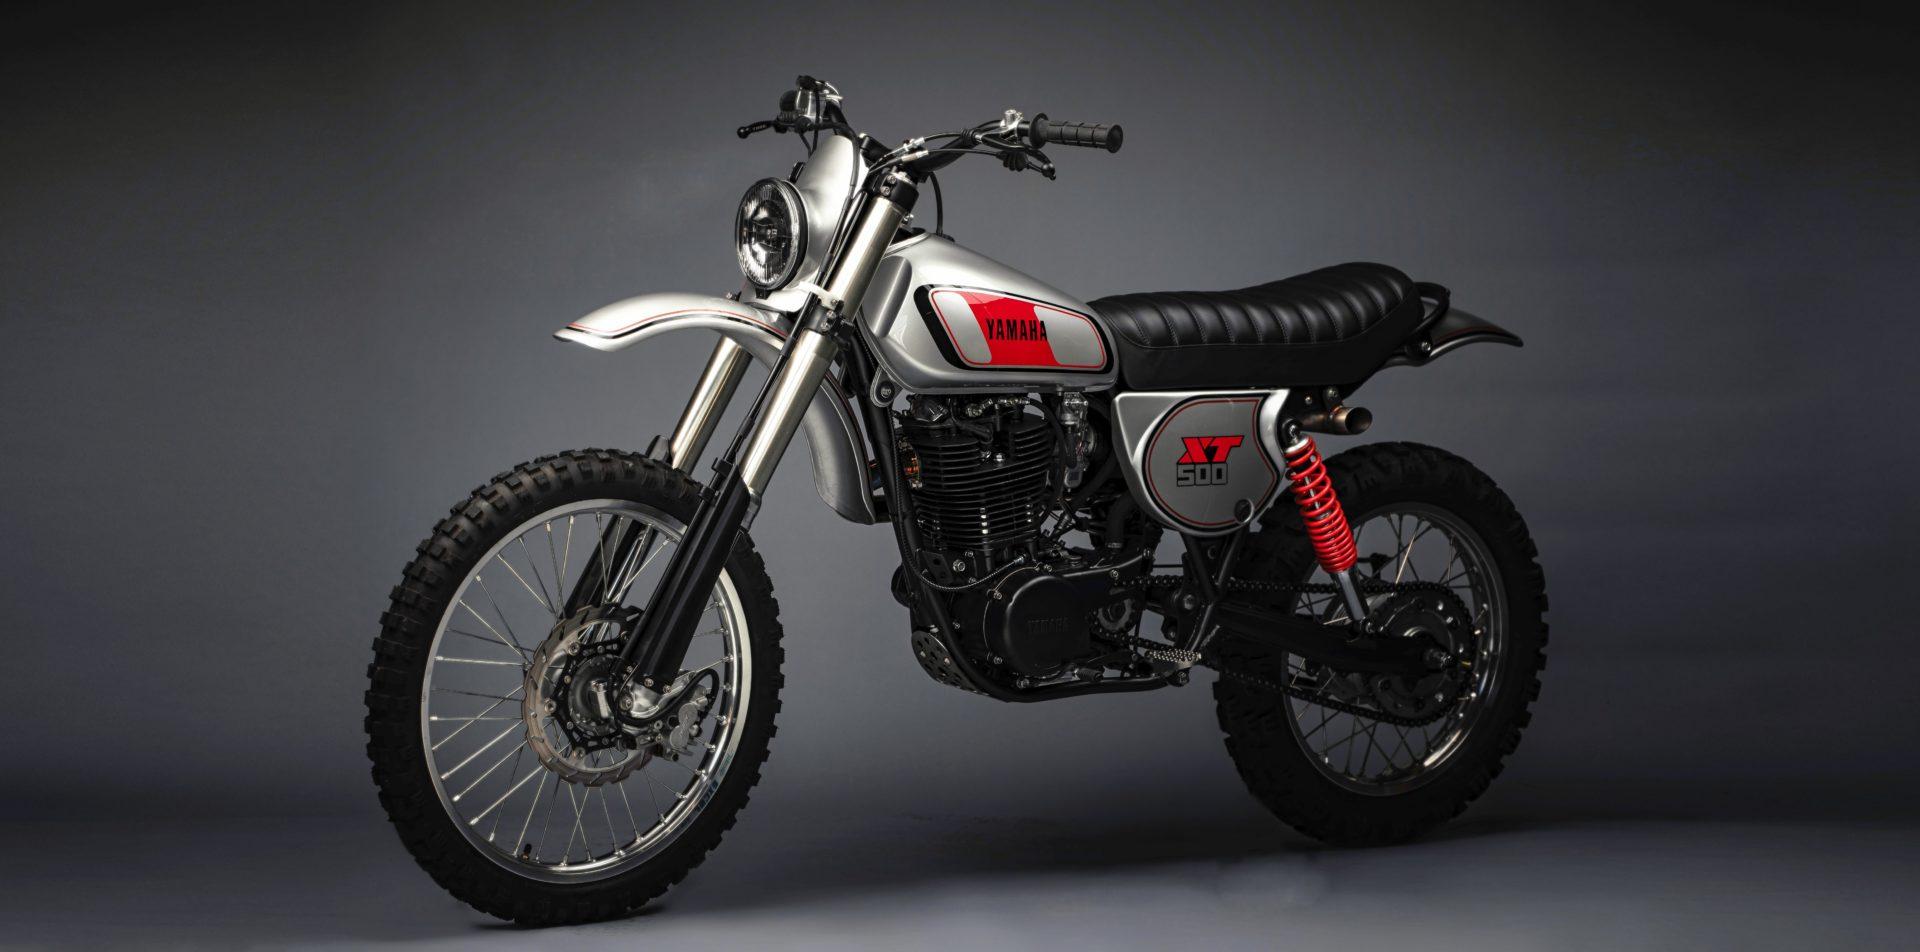 Yamaha XT500 by Motorelic